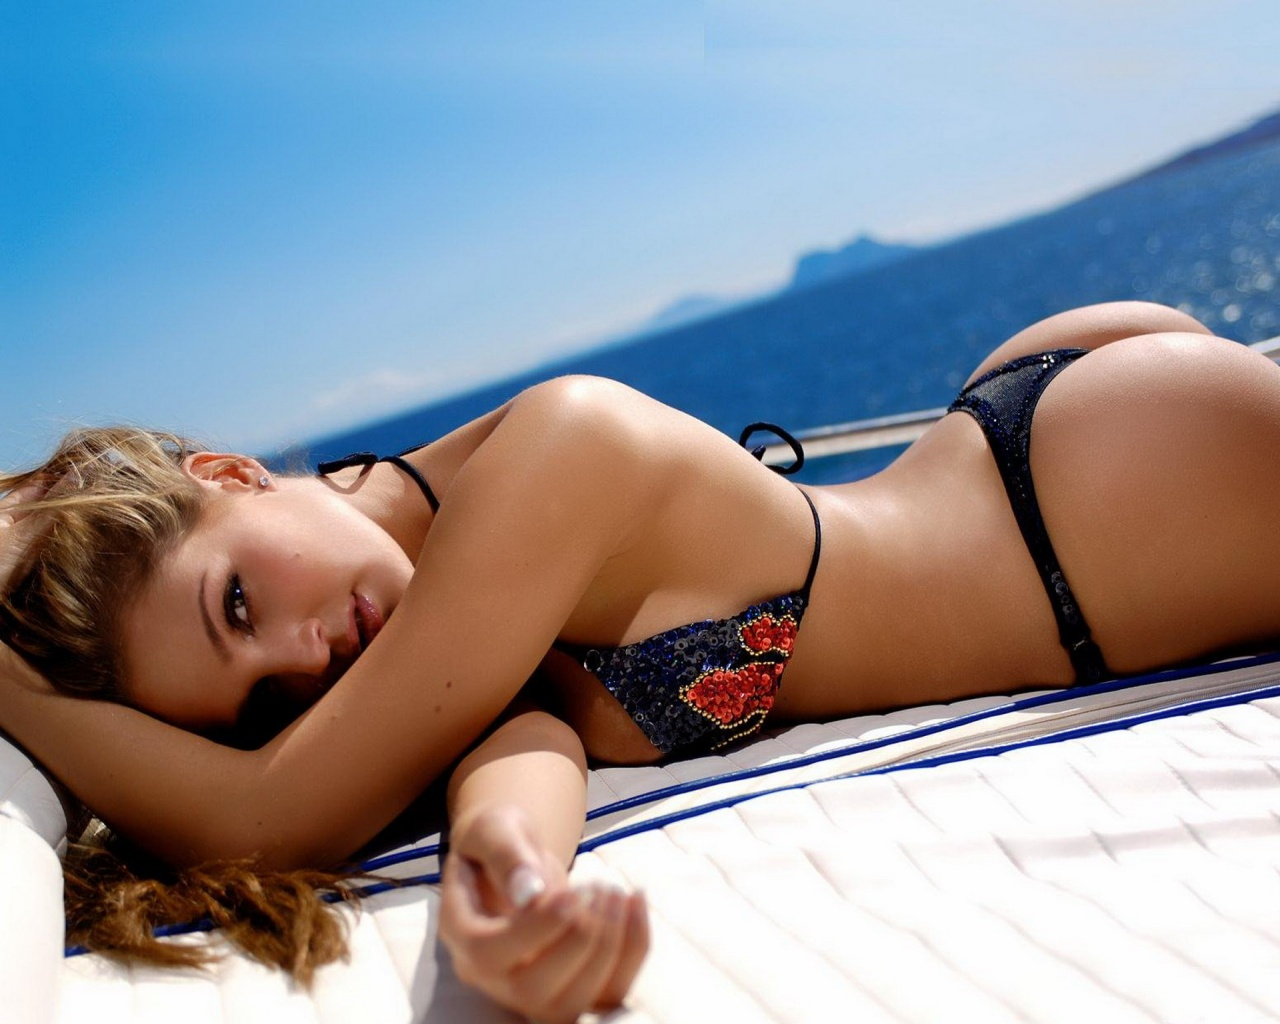 http://2.bp.blogspot.com/-09vE6r42tUo/T24RWb9XnYI/AAAAAAAAHus/0hF0XmuW3fE/s1600/Beach_Girl_Wallpaper1.jpg